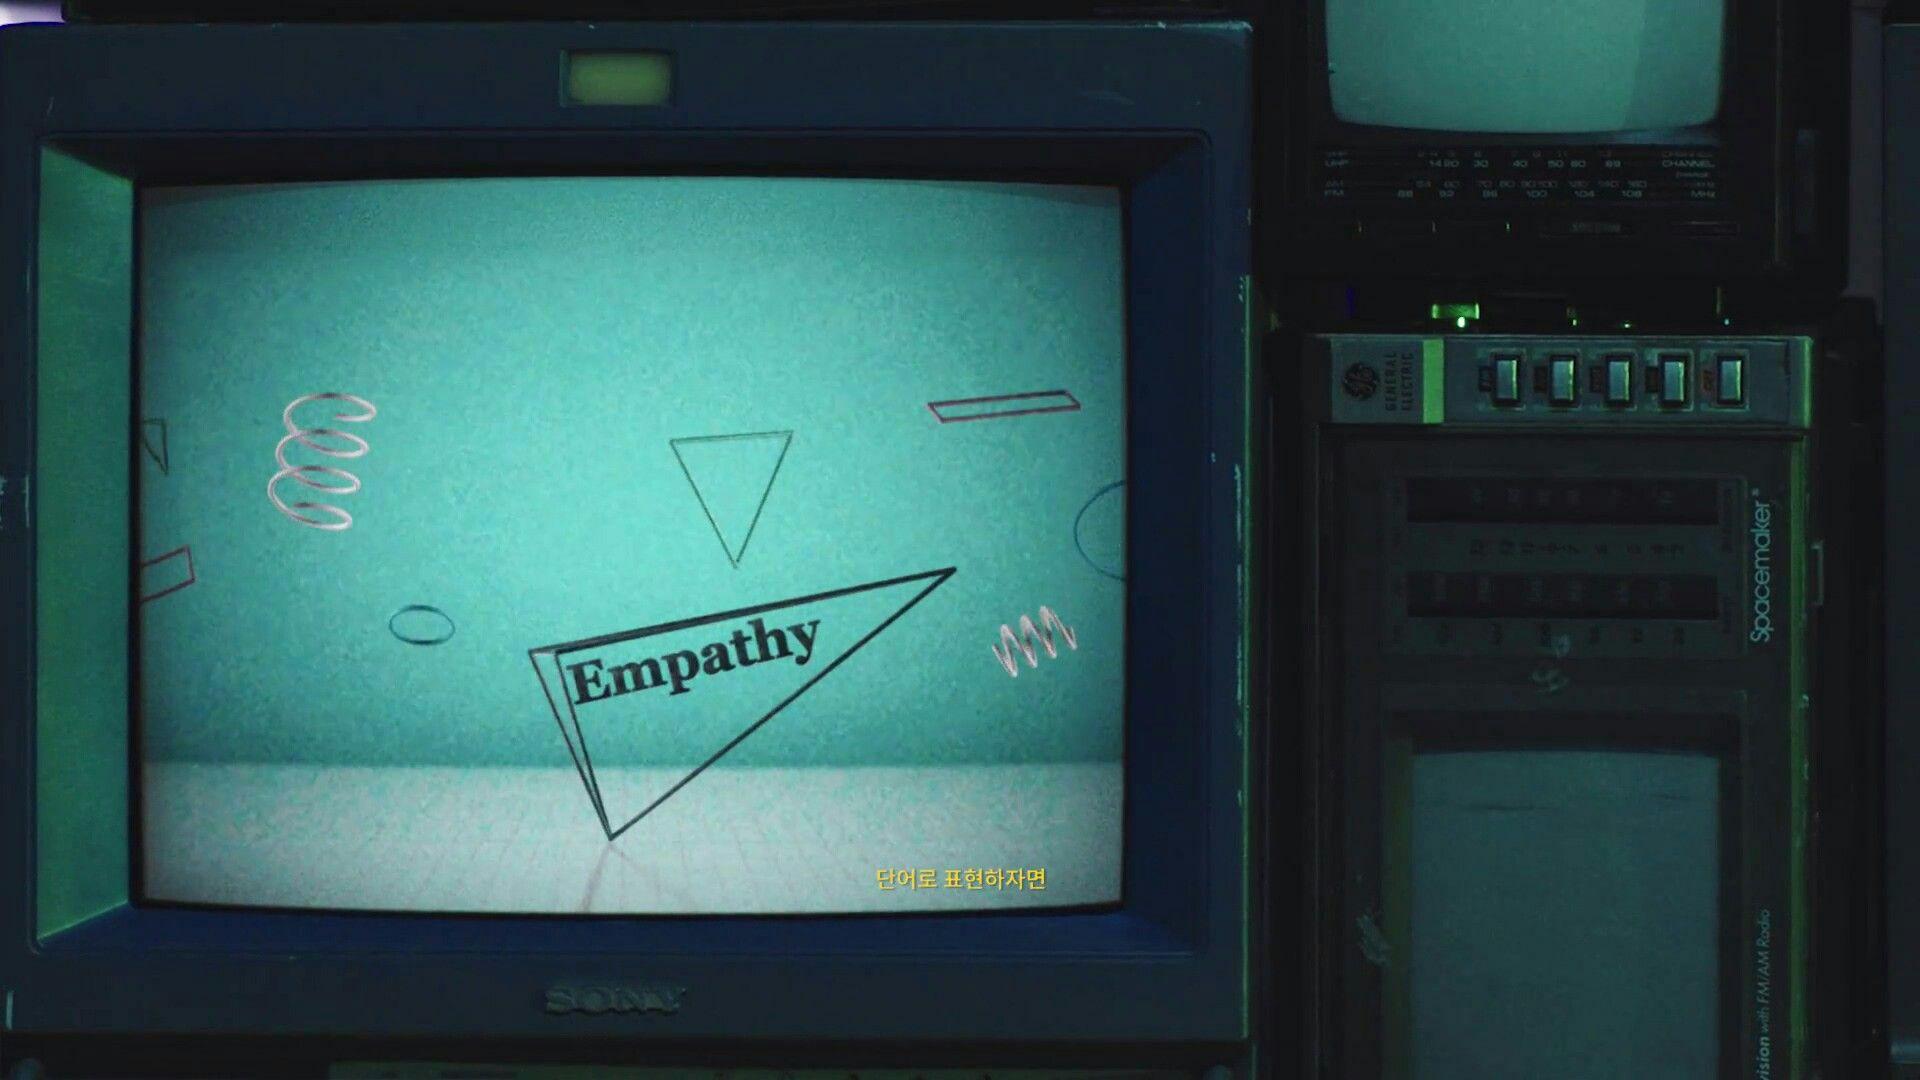 NCTmentary eps.3 (5) Nct dream, Lock screen wallpaper